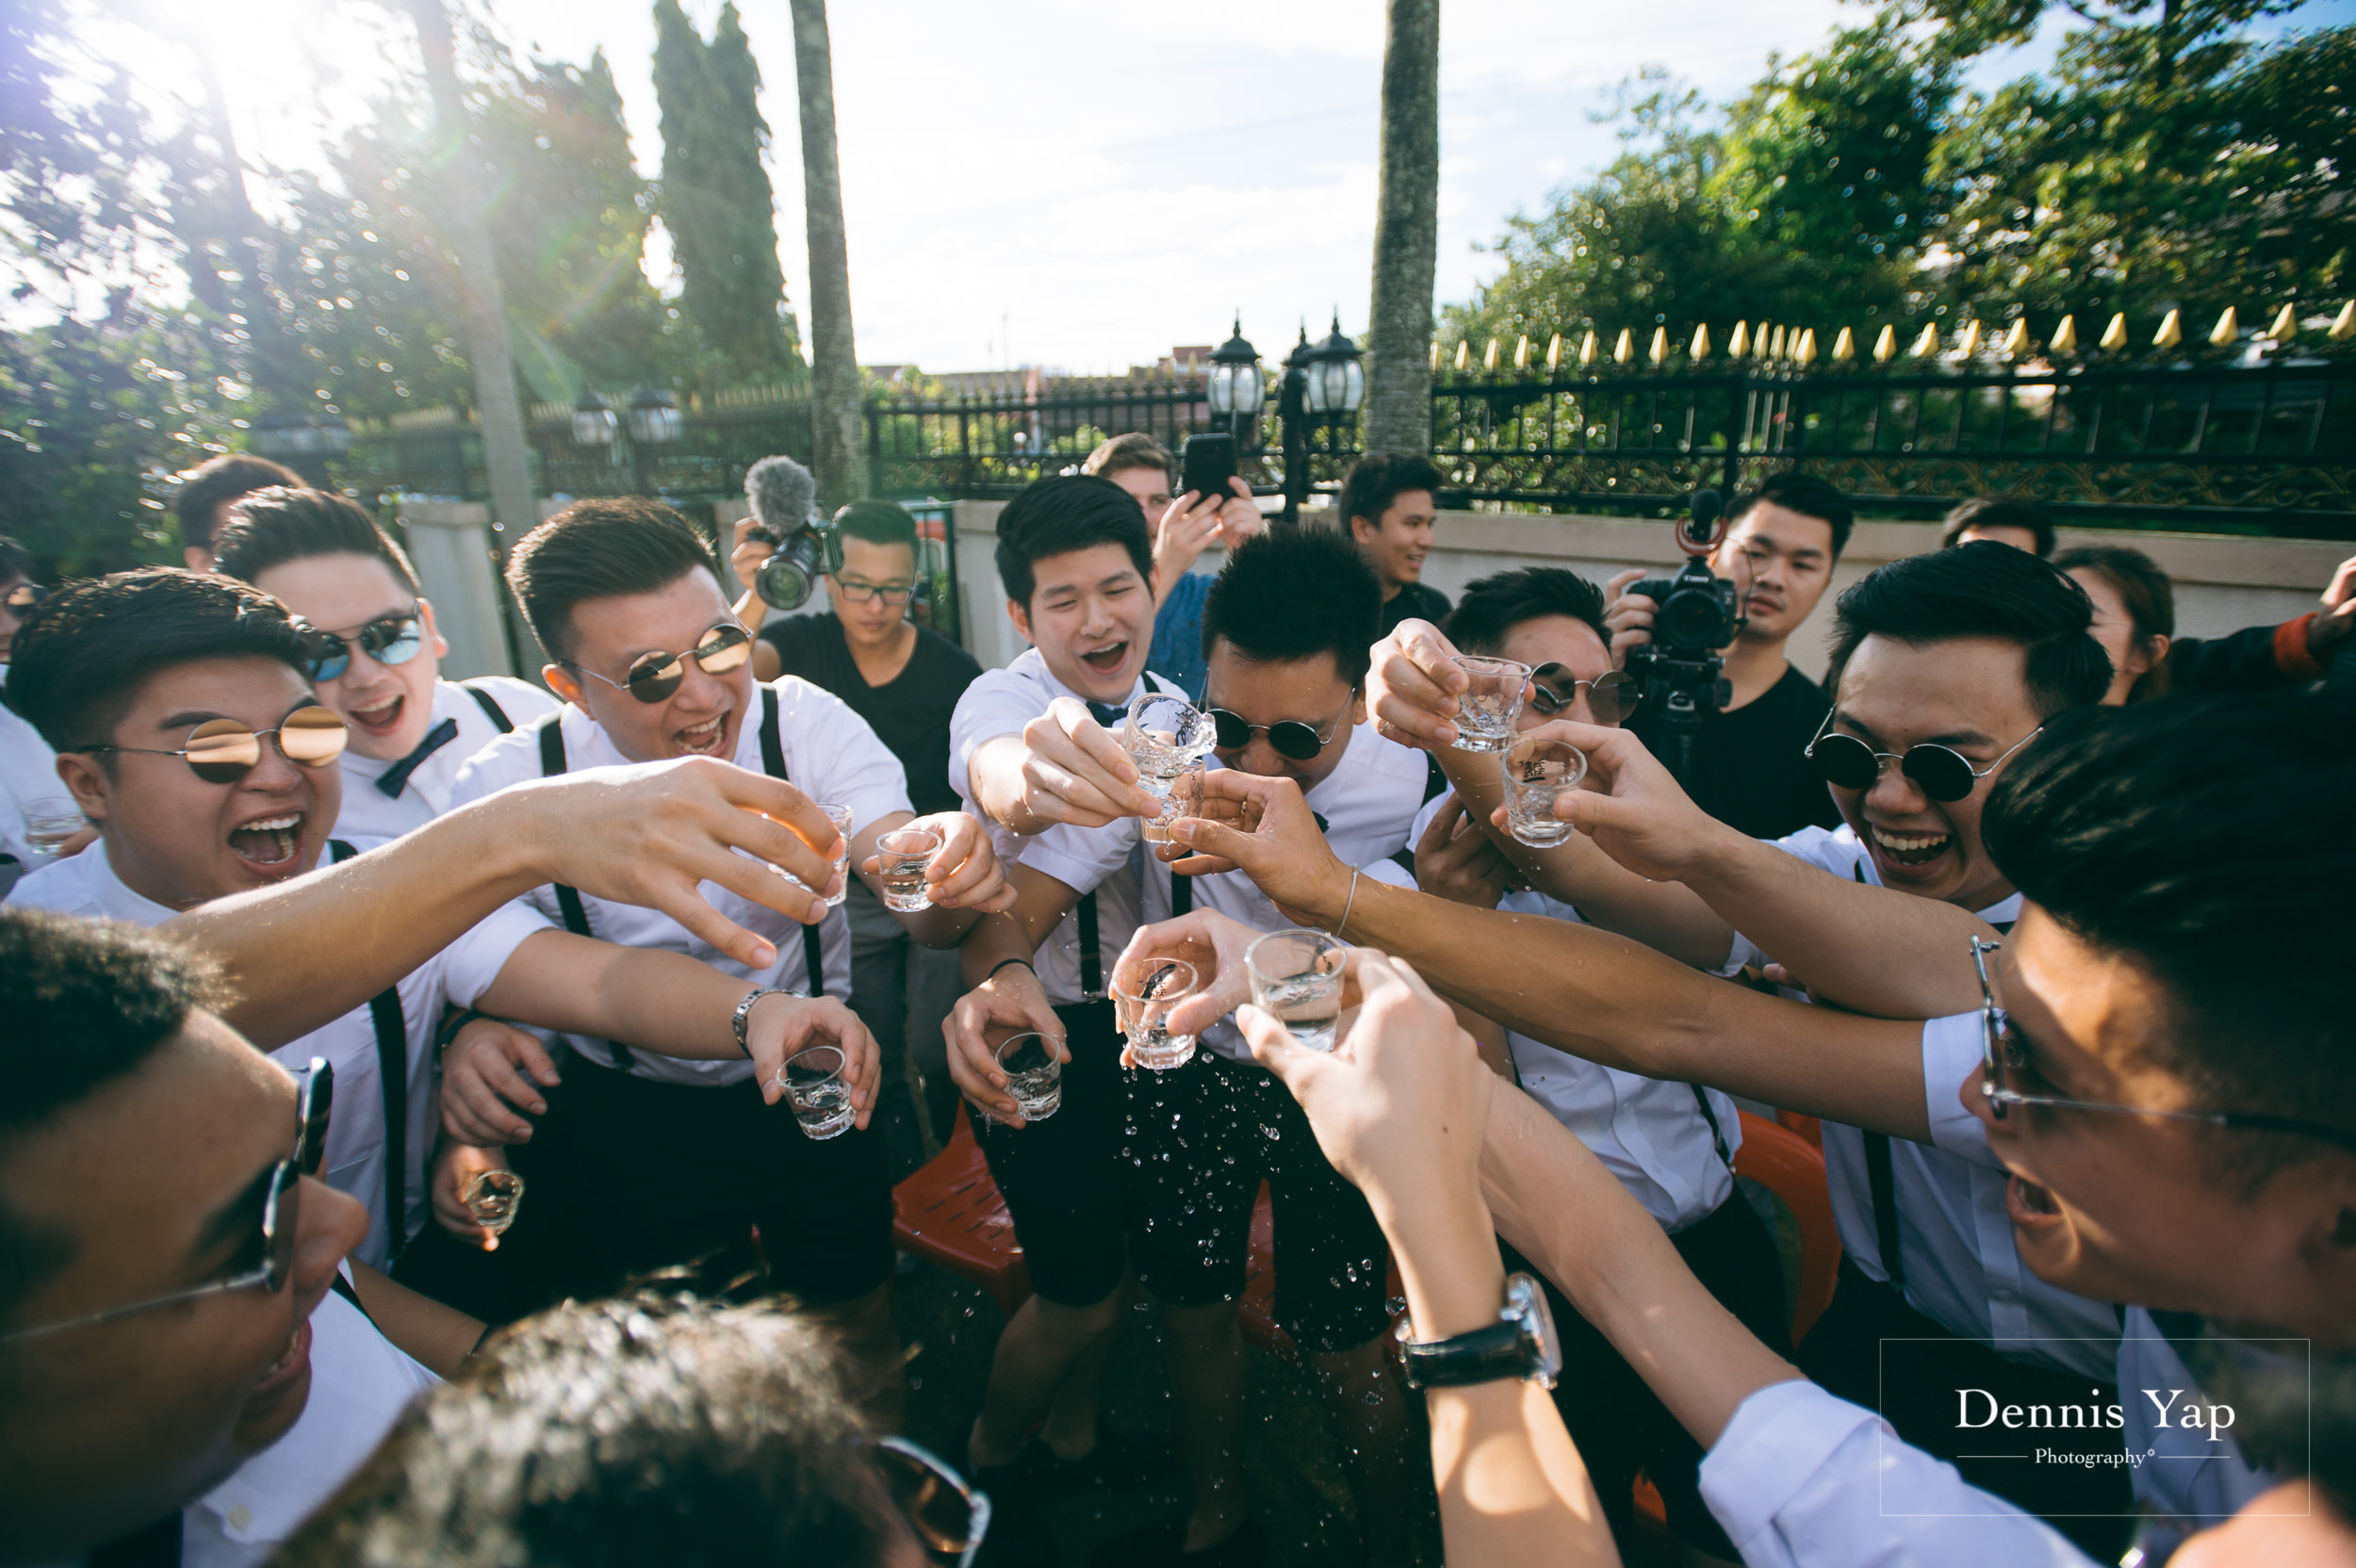 kuan rachel wedding day kuala lumpur melbourne gate crash dennis yap malaysia wedding photographer-9.jpg